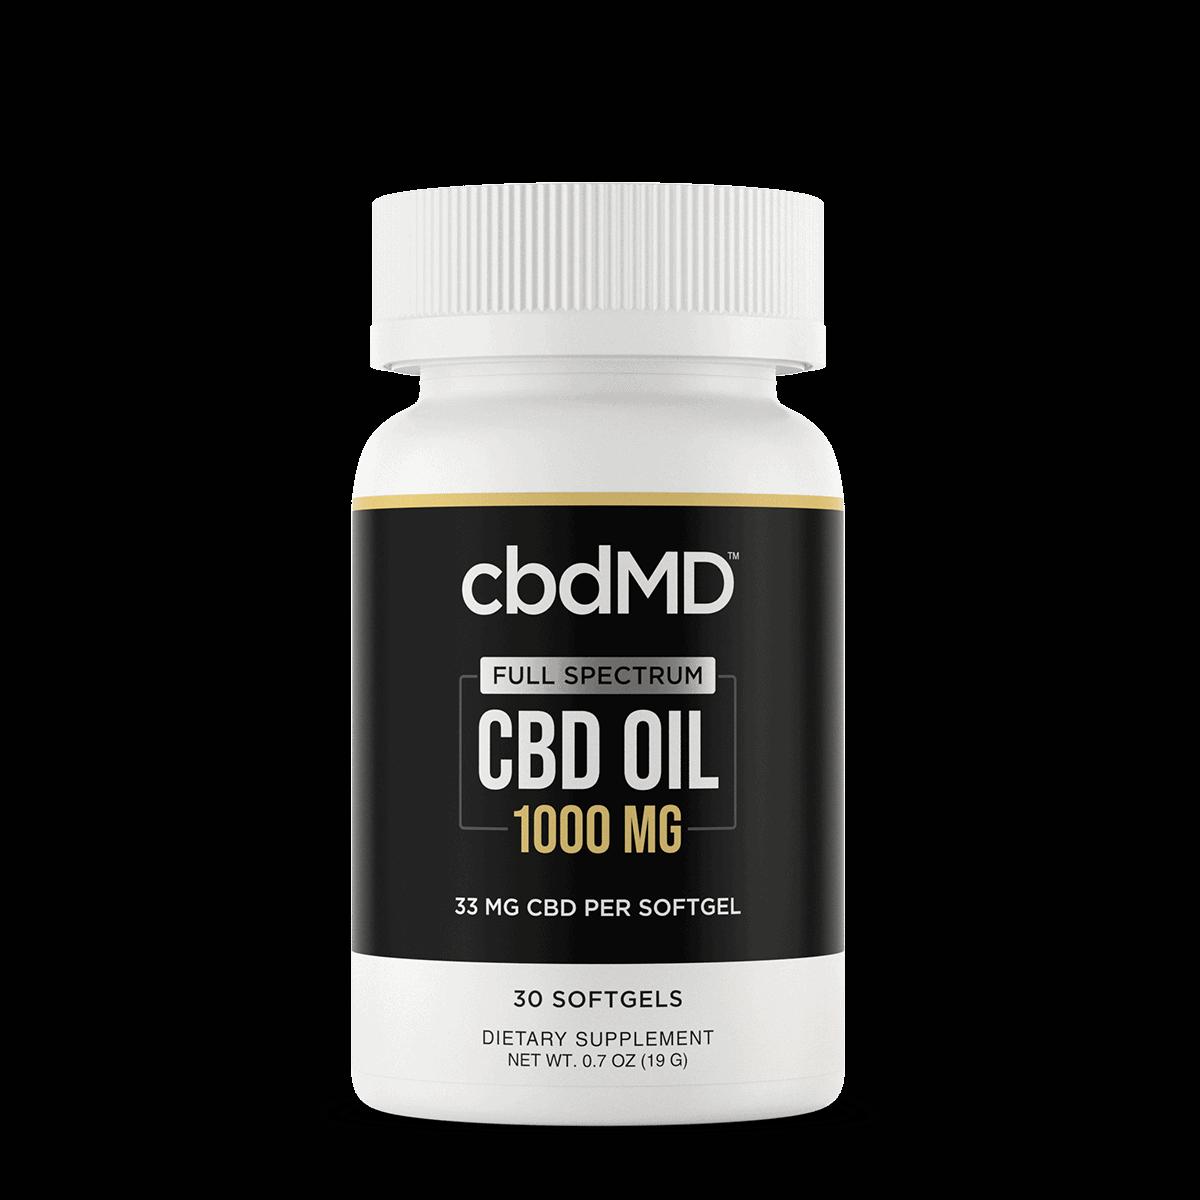 cbdMD, CBD Oil Softgels, Full Spectrum, 30-Count, 1000mg CBD 1